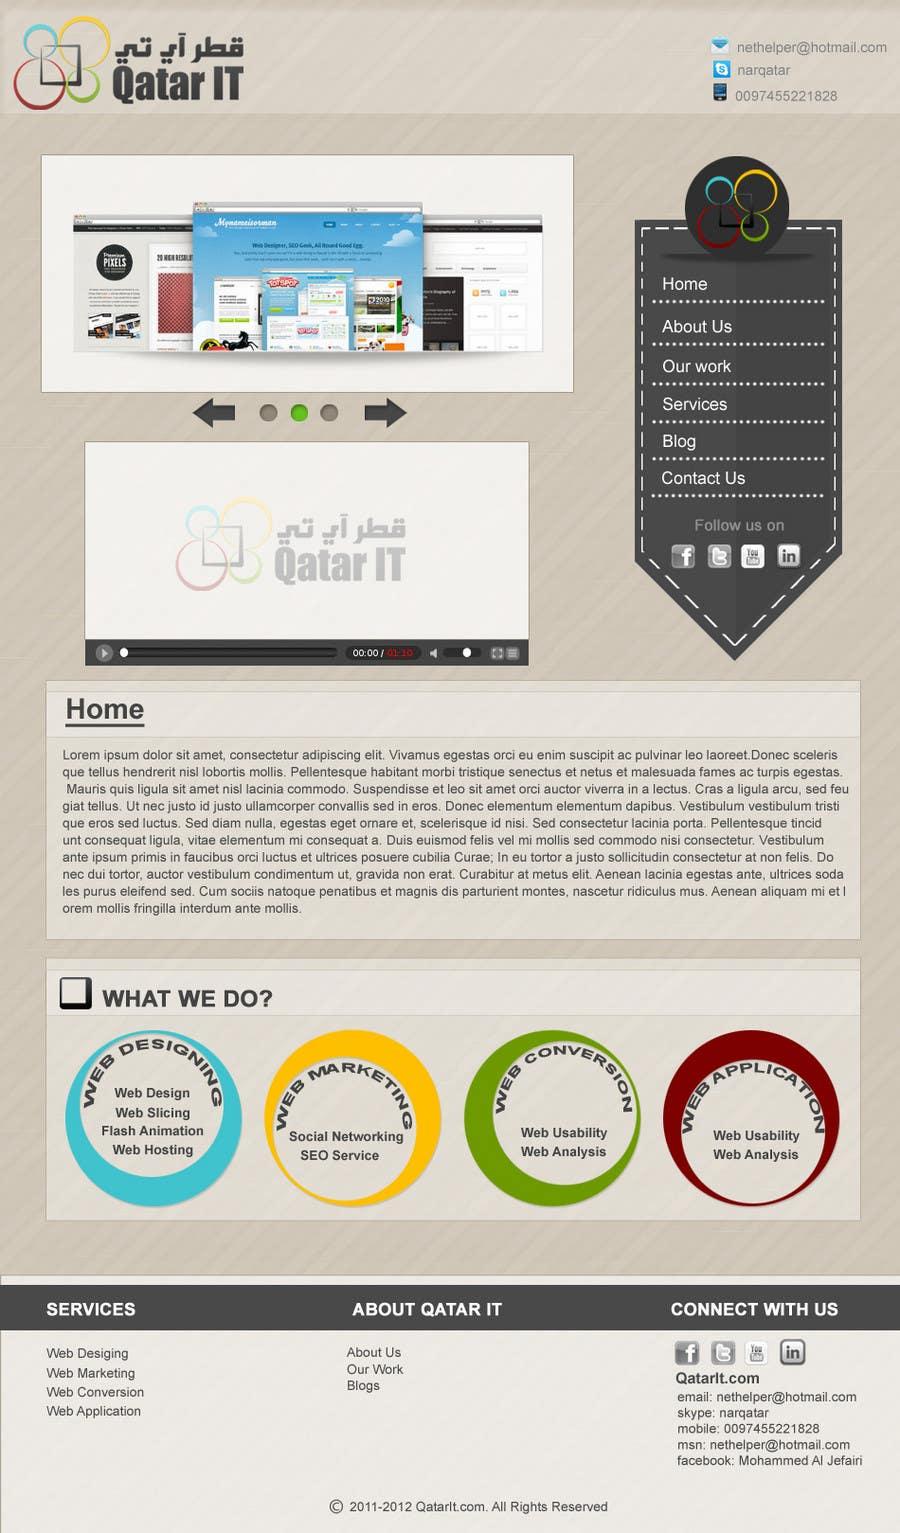 Bài tham dự cuộc thi #                                        101                                      cho                                         Website Design for Qatar IT